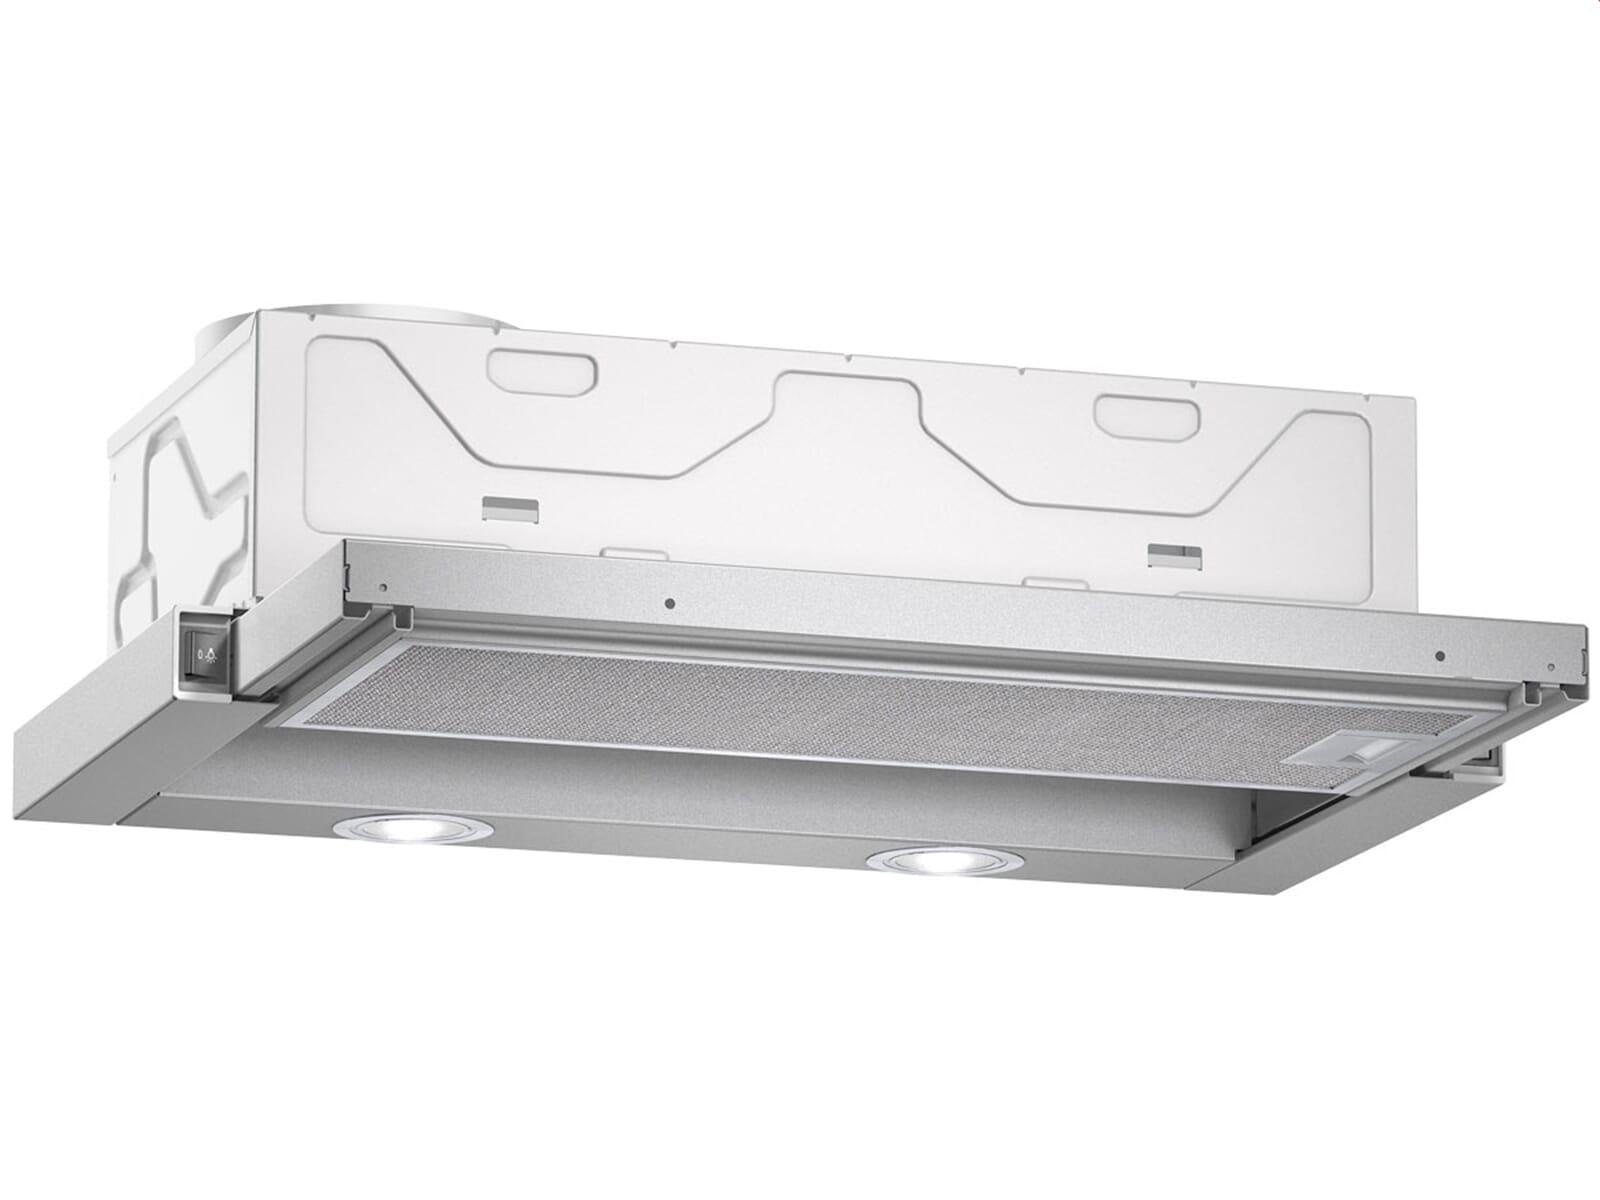 neff dbr 4622 x flachschirmhaube silbermetallic. Black Bedroom Furniture Sets. Home Design Ideas